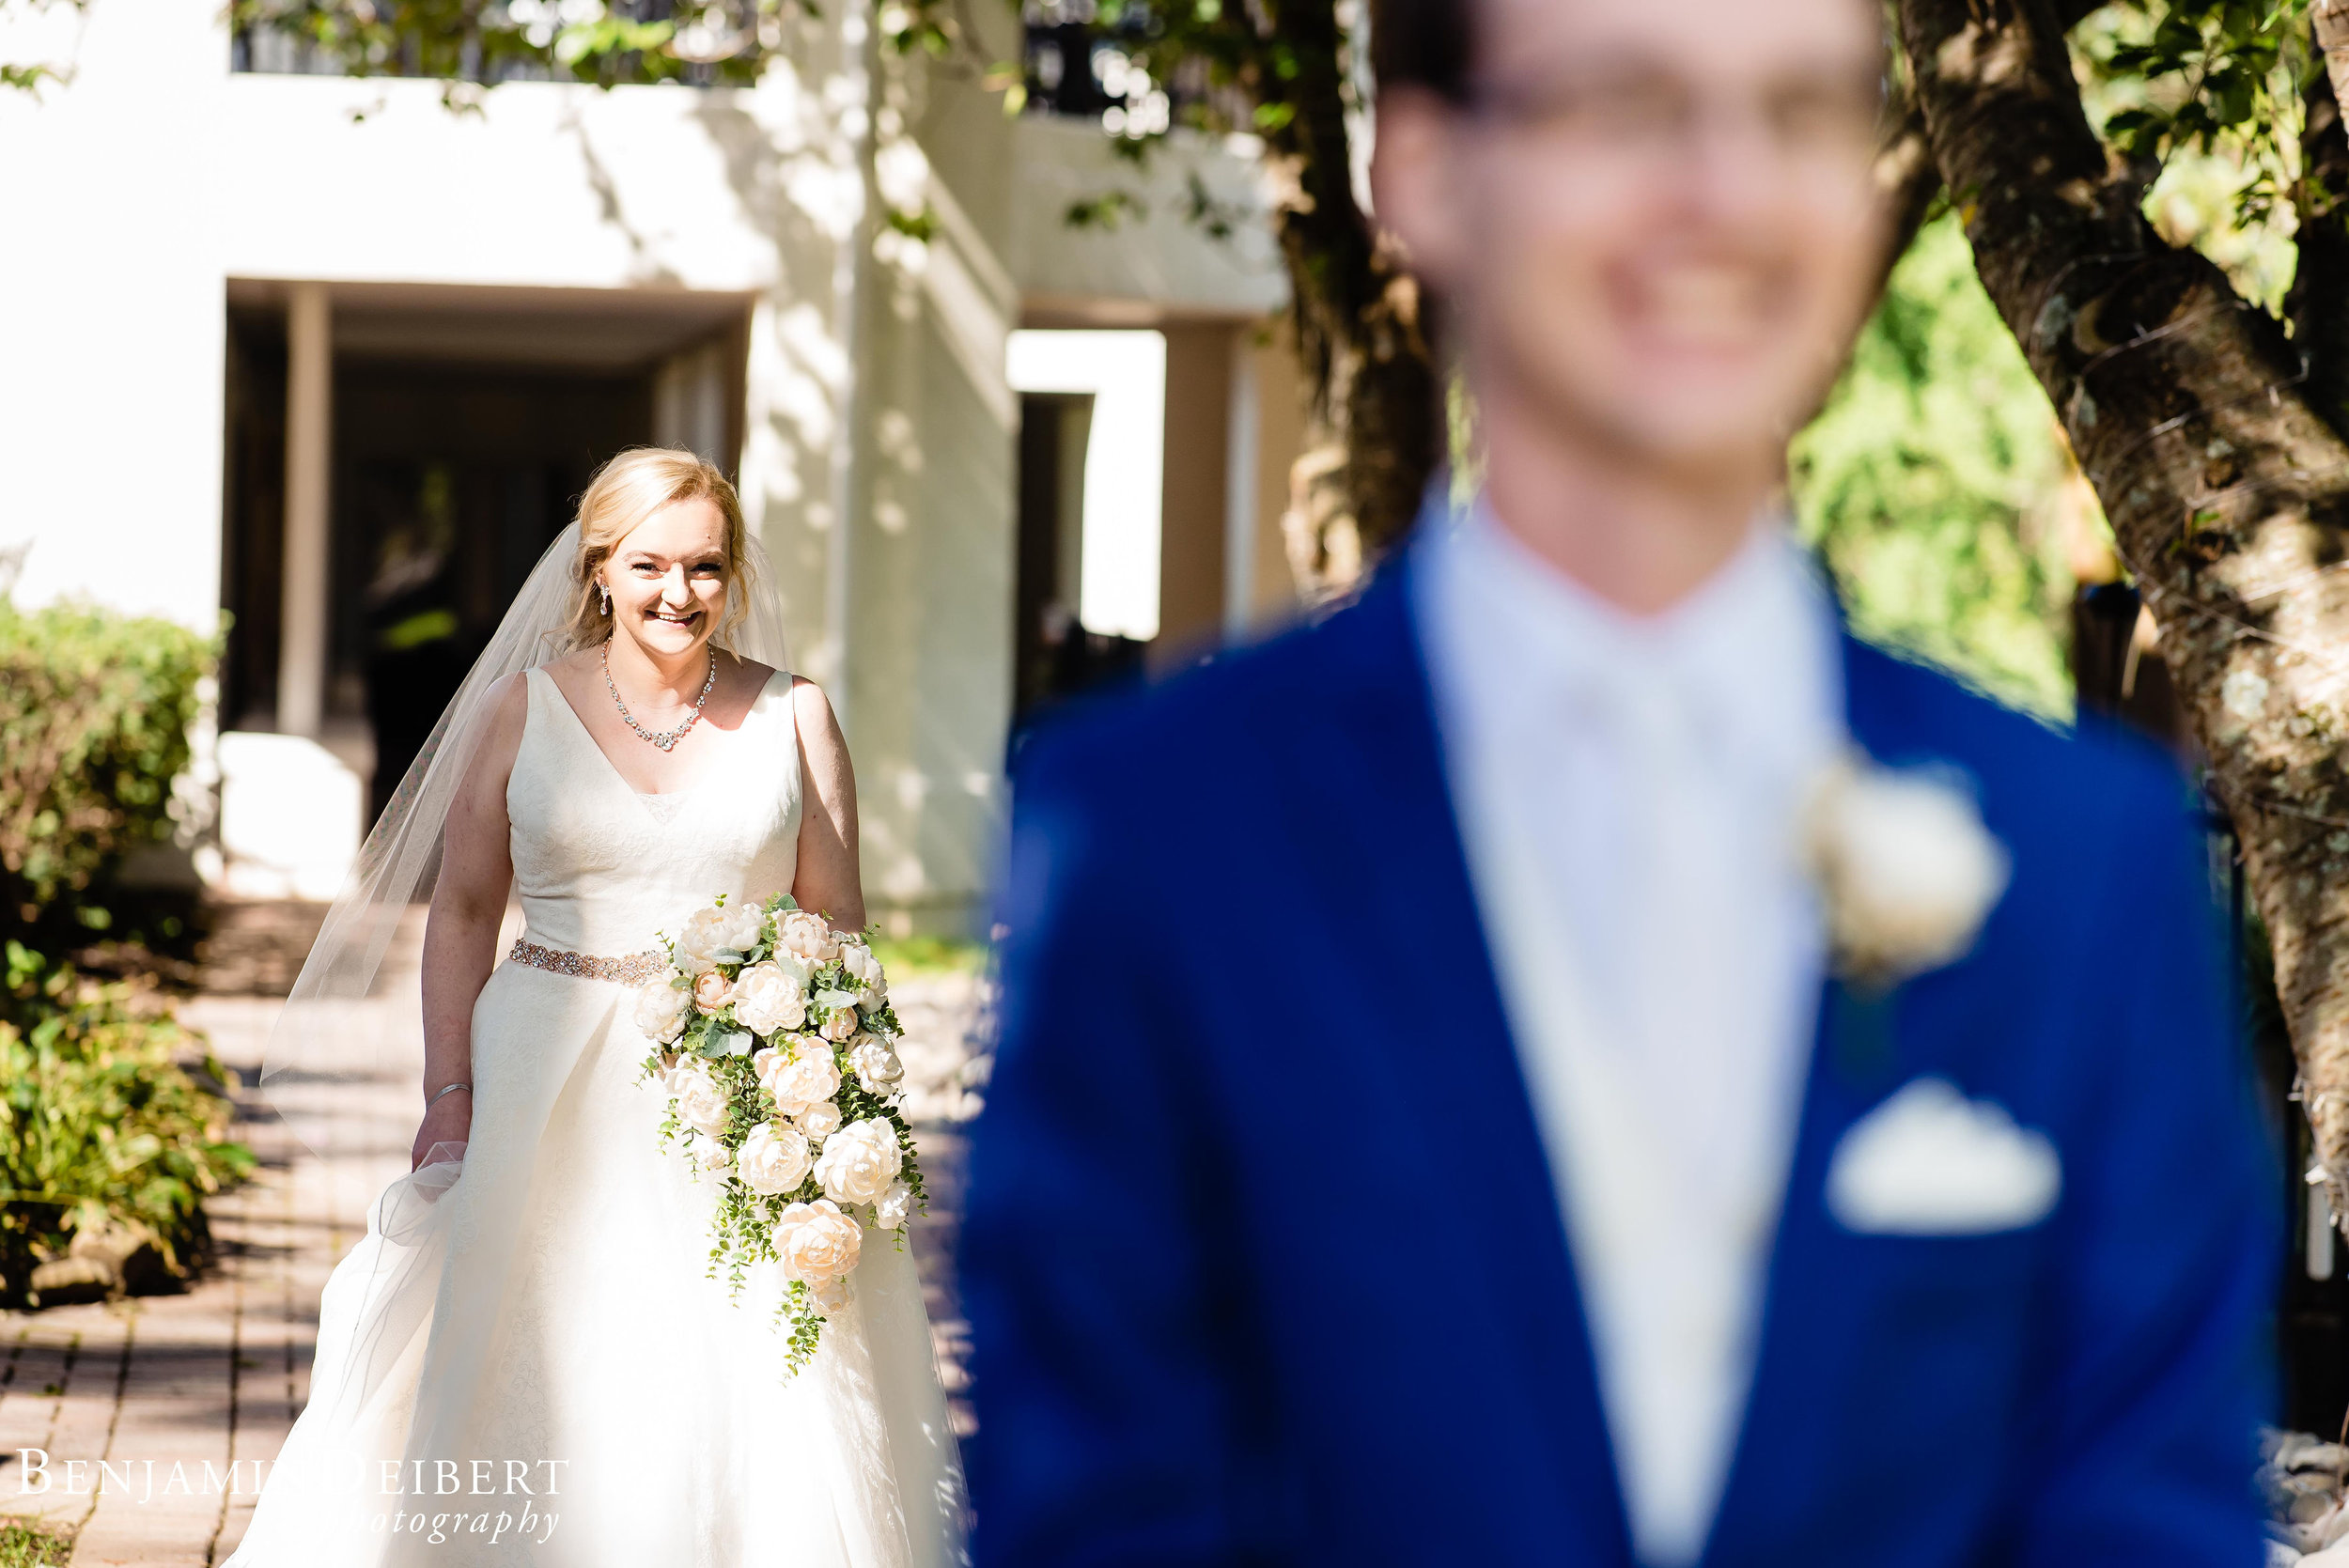 AshleyandDerrick_RadnorValleyCountryClub_Wedding-23.jpg